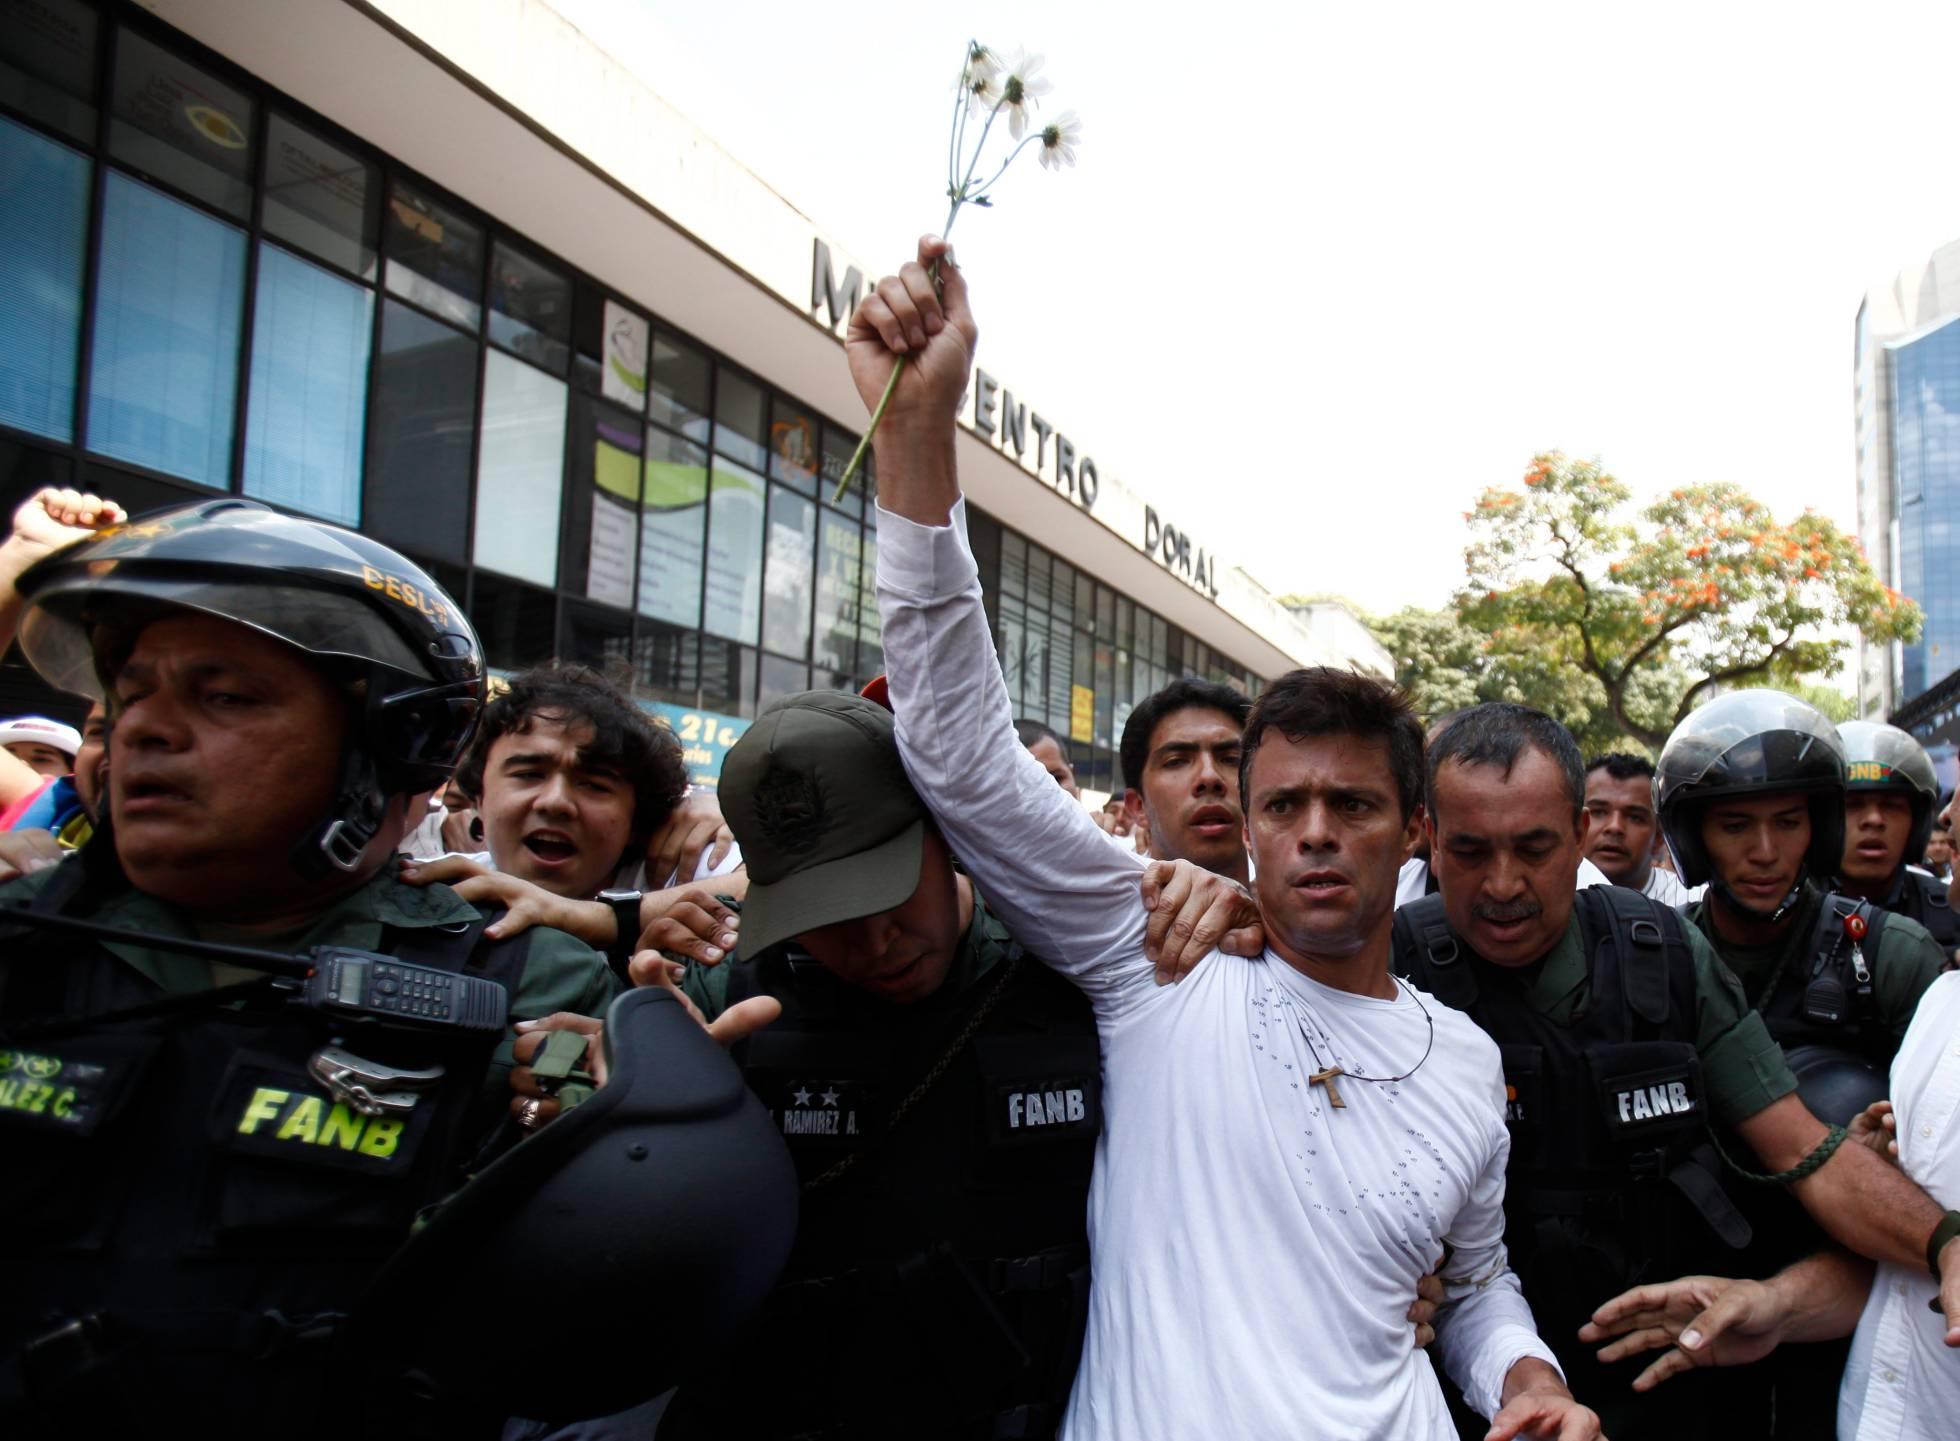 Venezuelan opposition leader Leopoldo Lopez back in house arrest